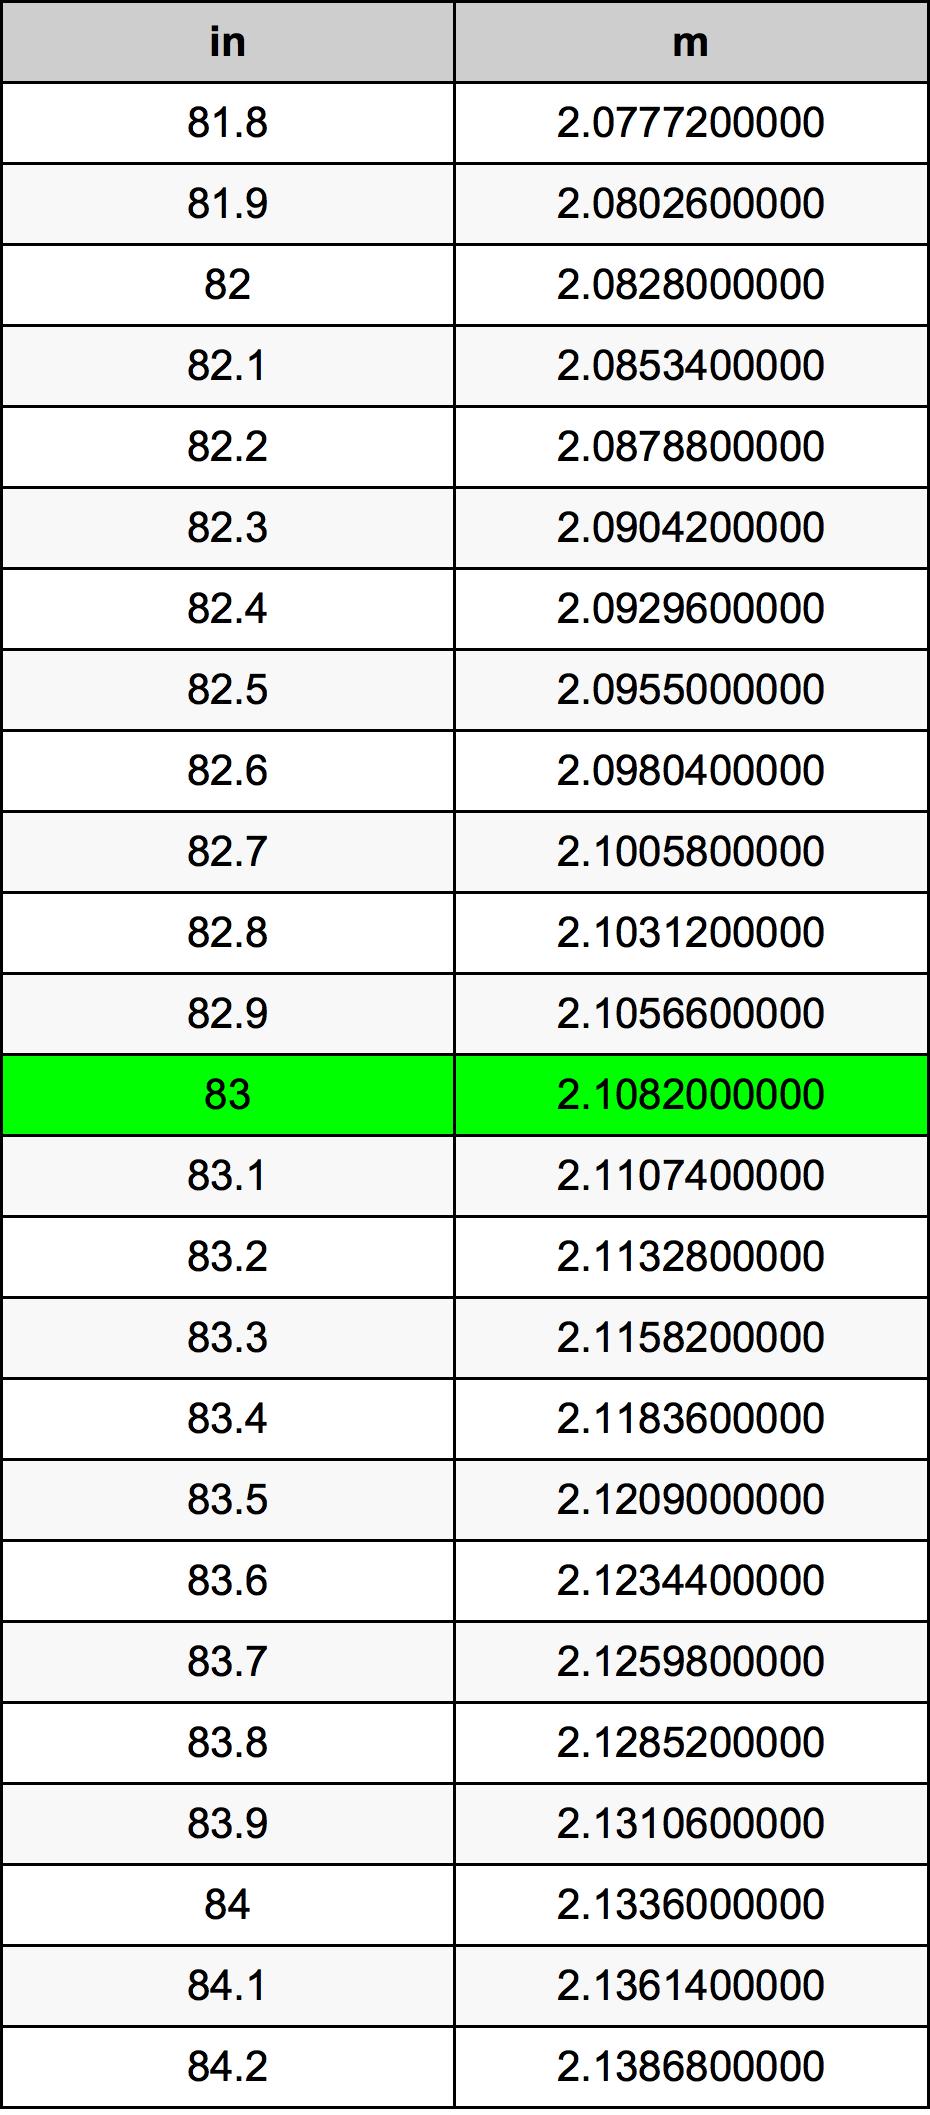 83 Inch konverteringstabell